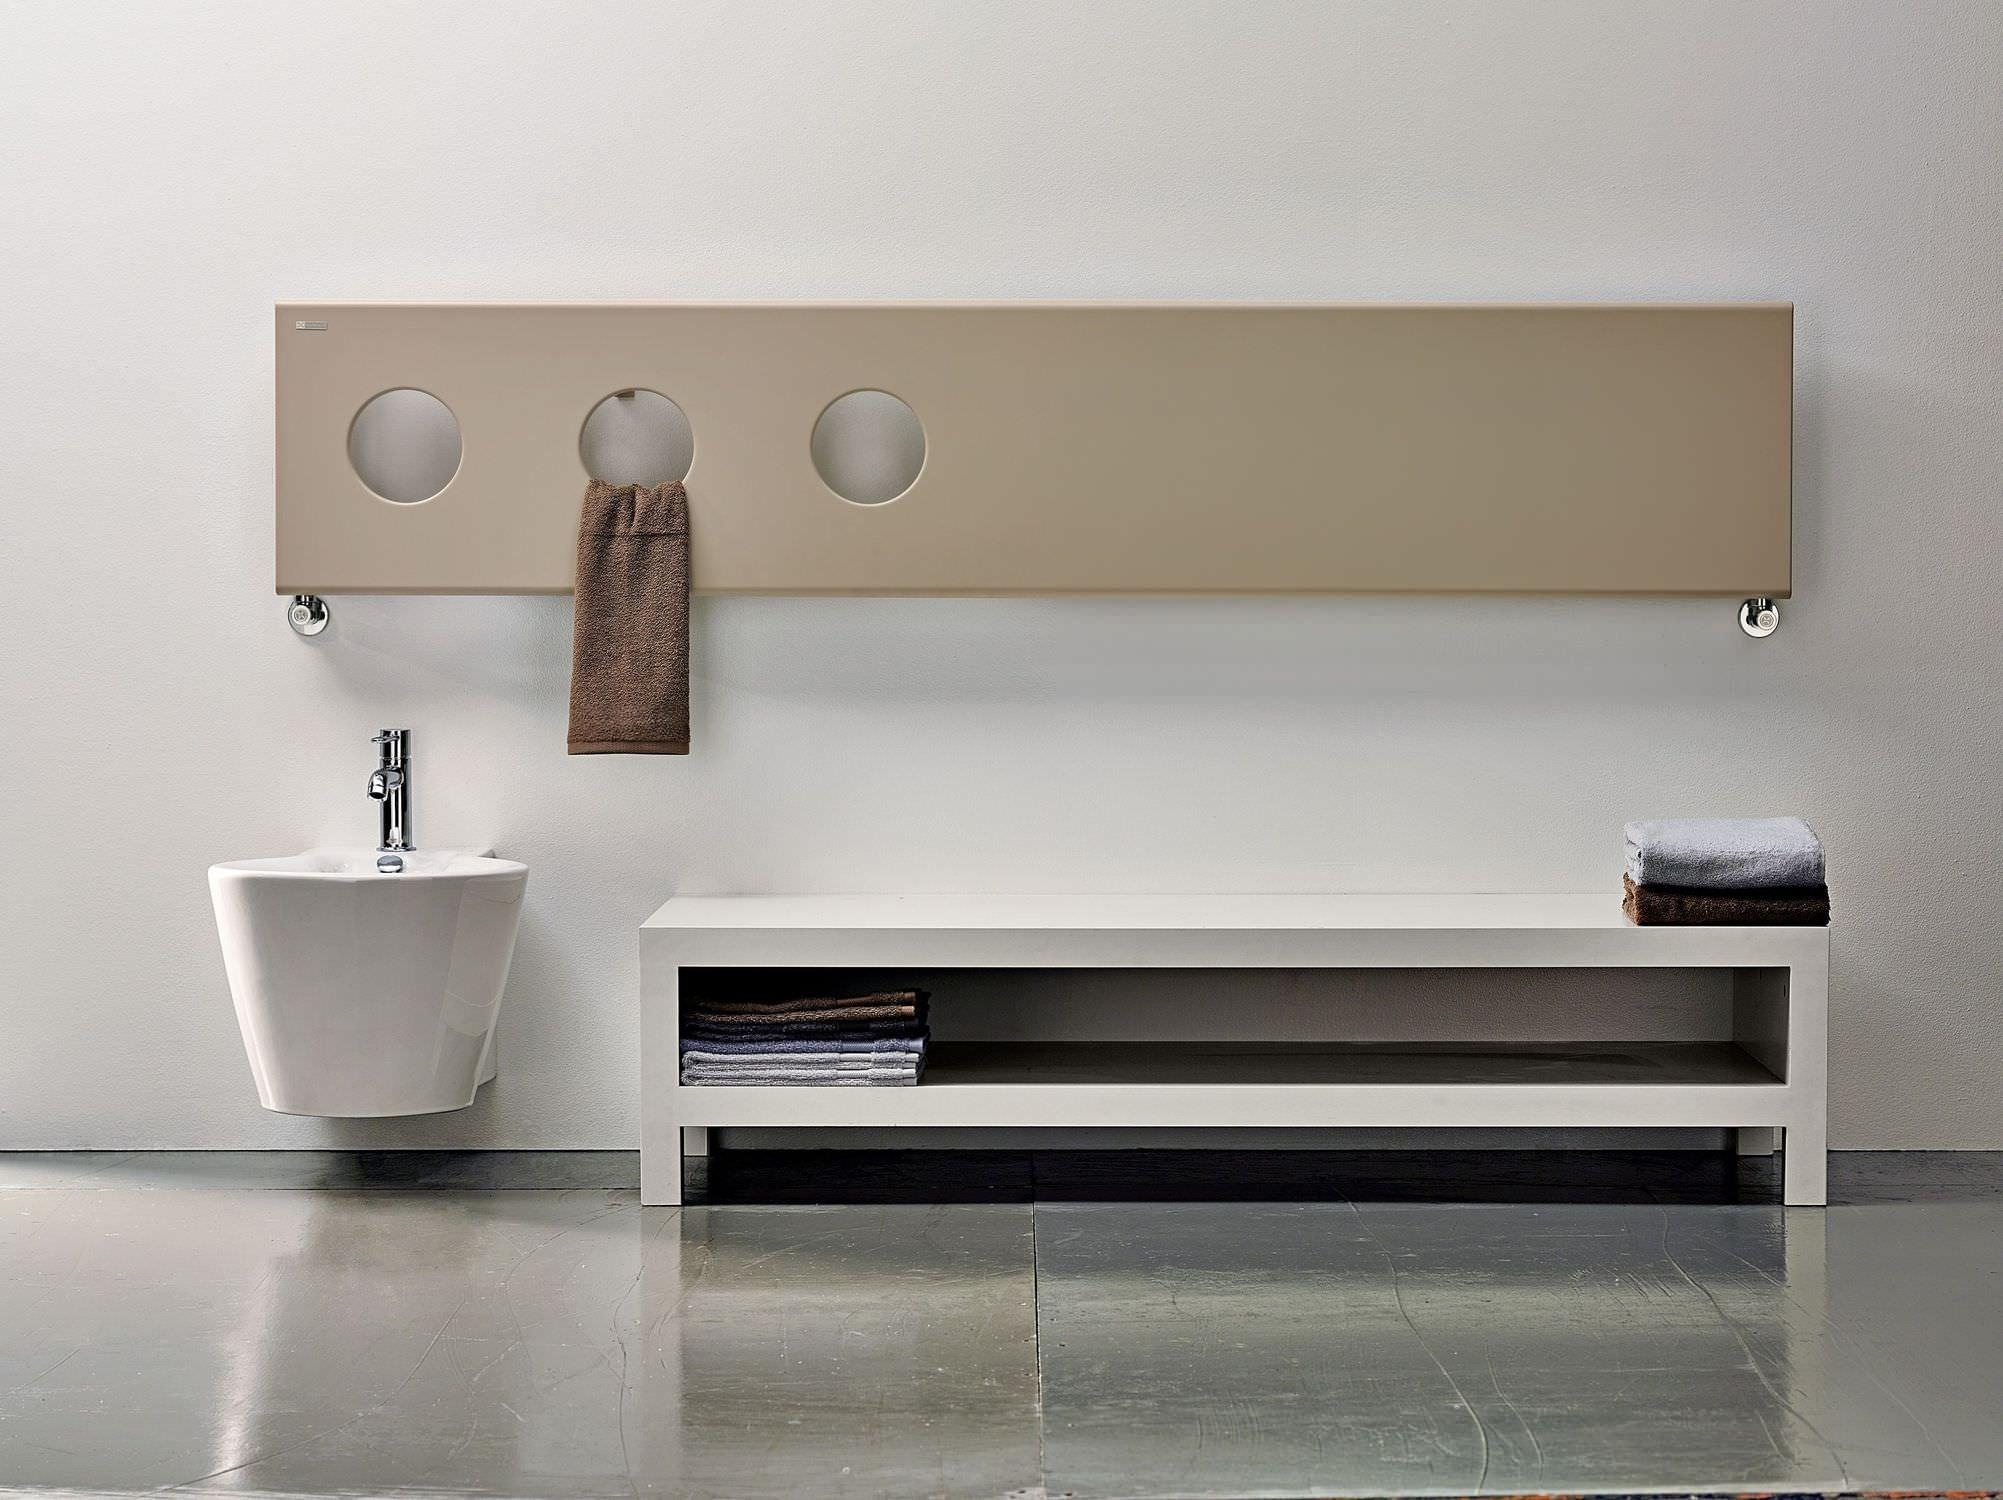 stijlvolle handdoekradiator badkamer